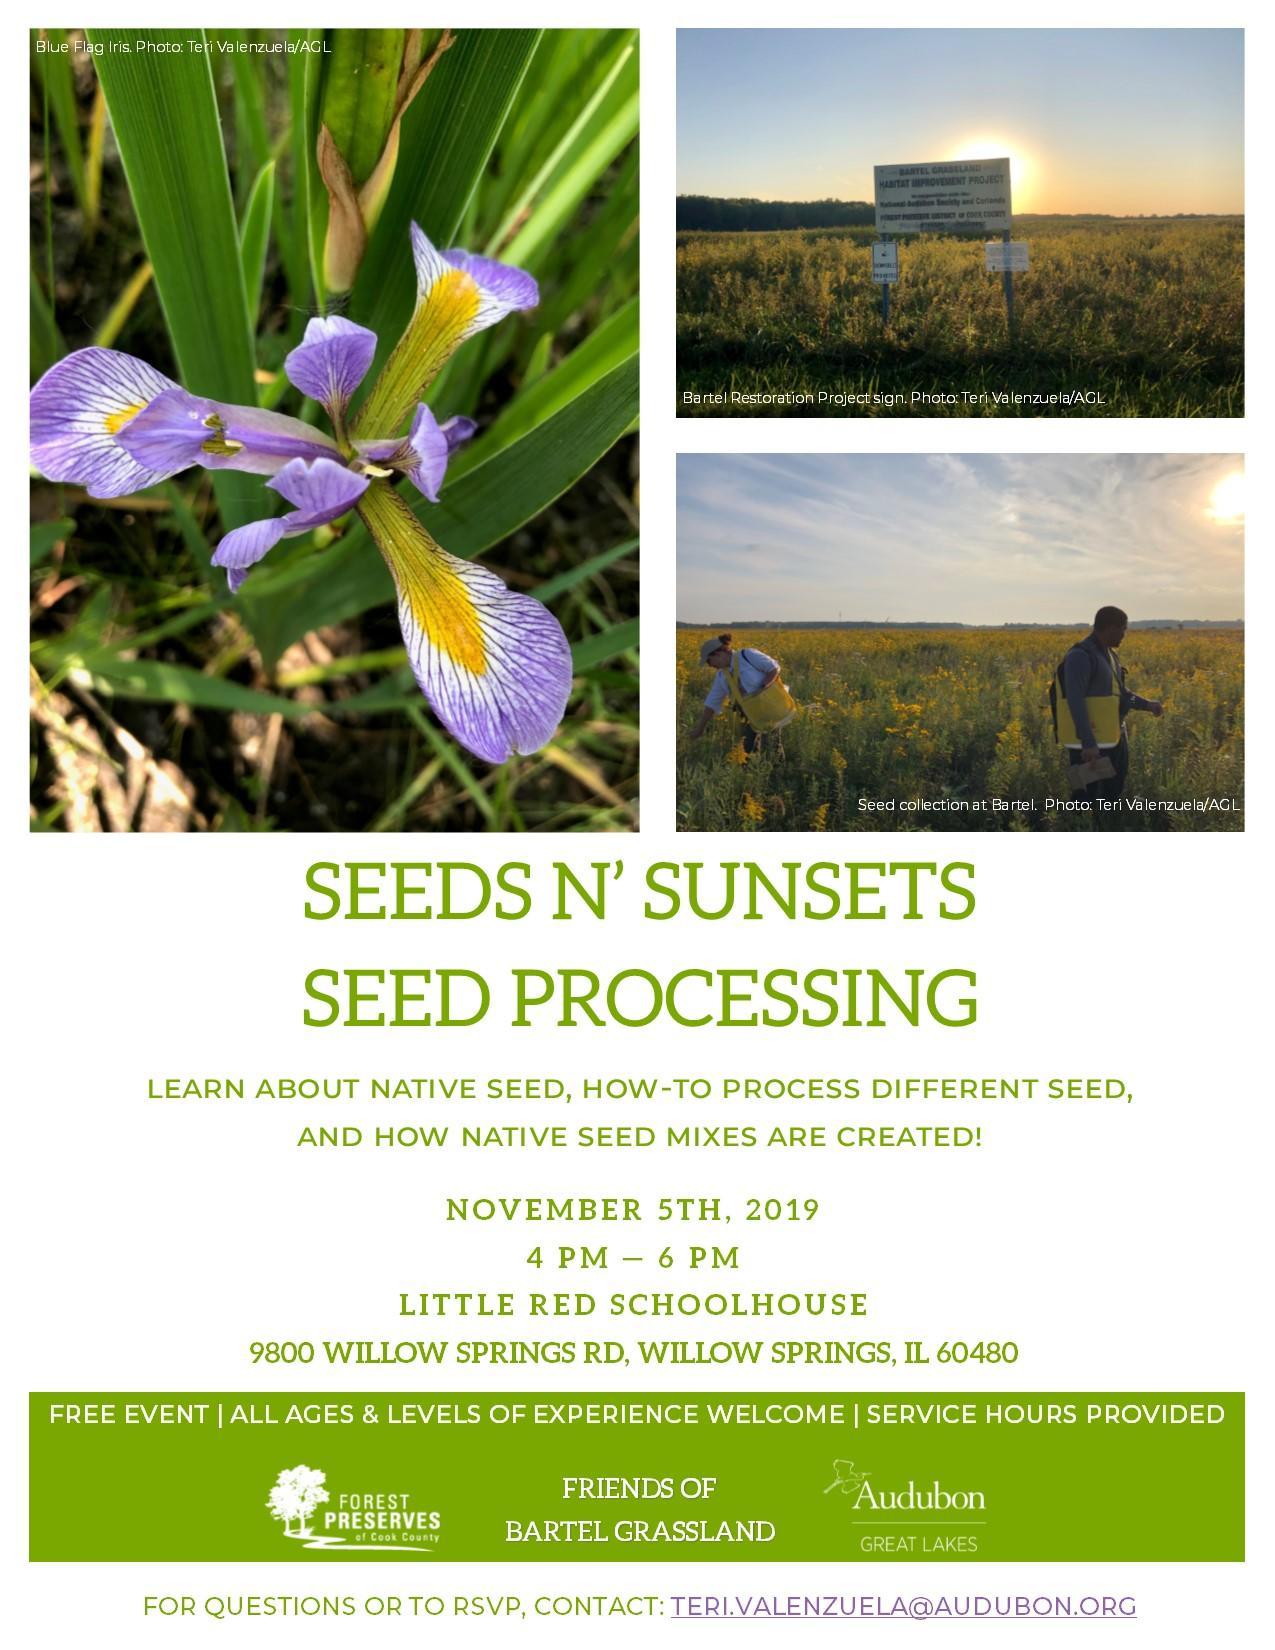 Bartel Grassland Seed Processing